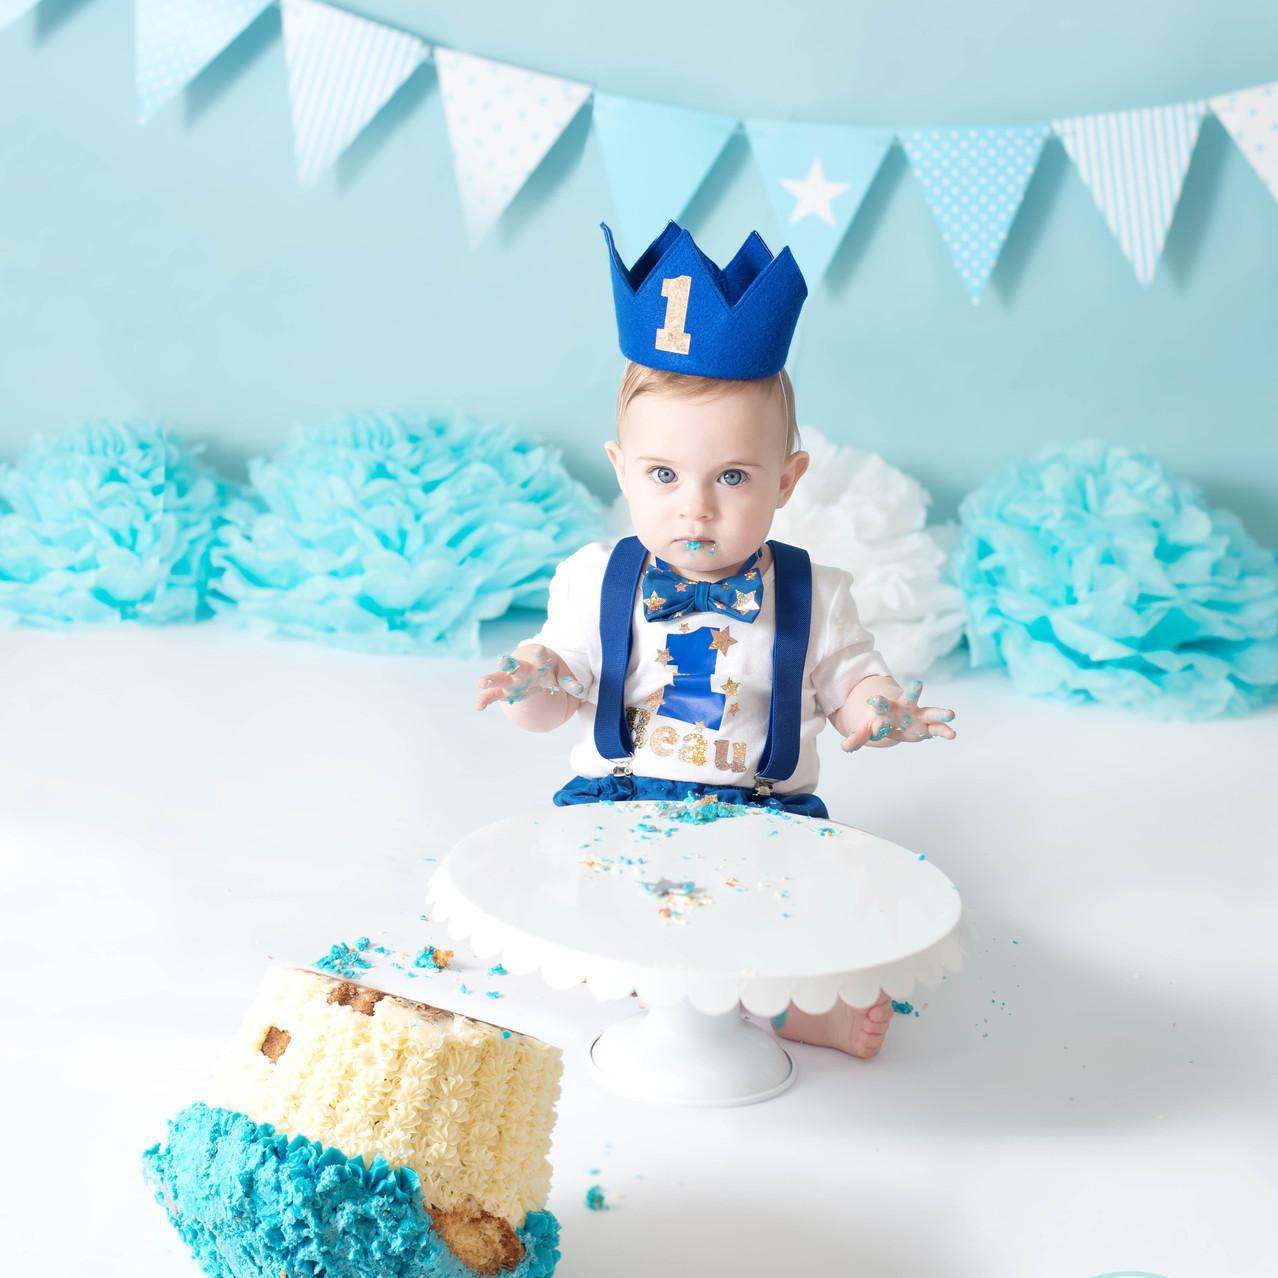 Boy cake smash cake on the floor